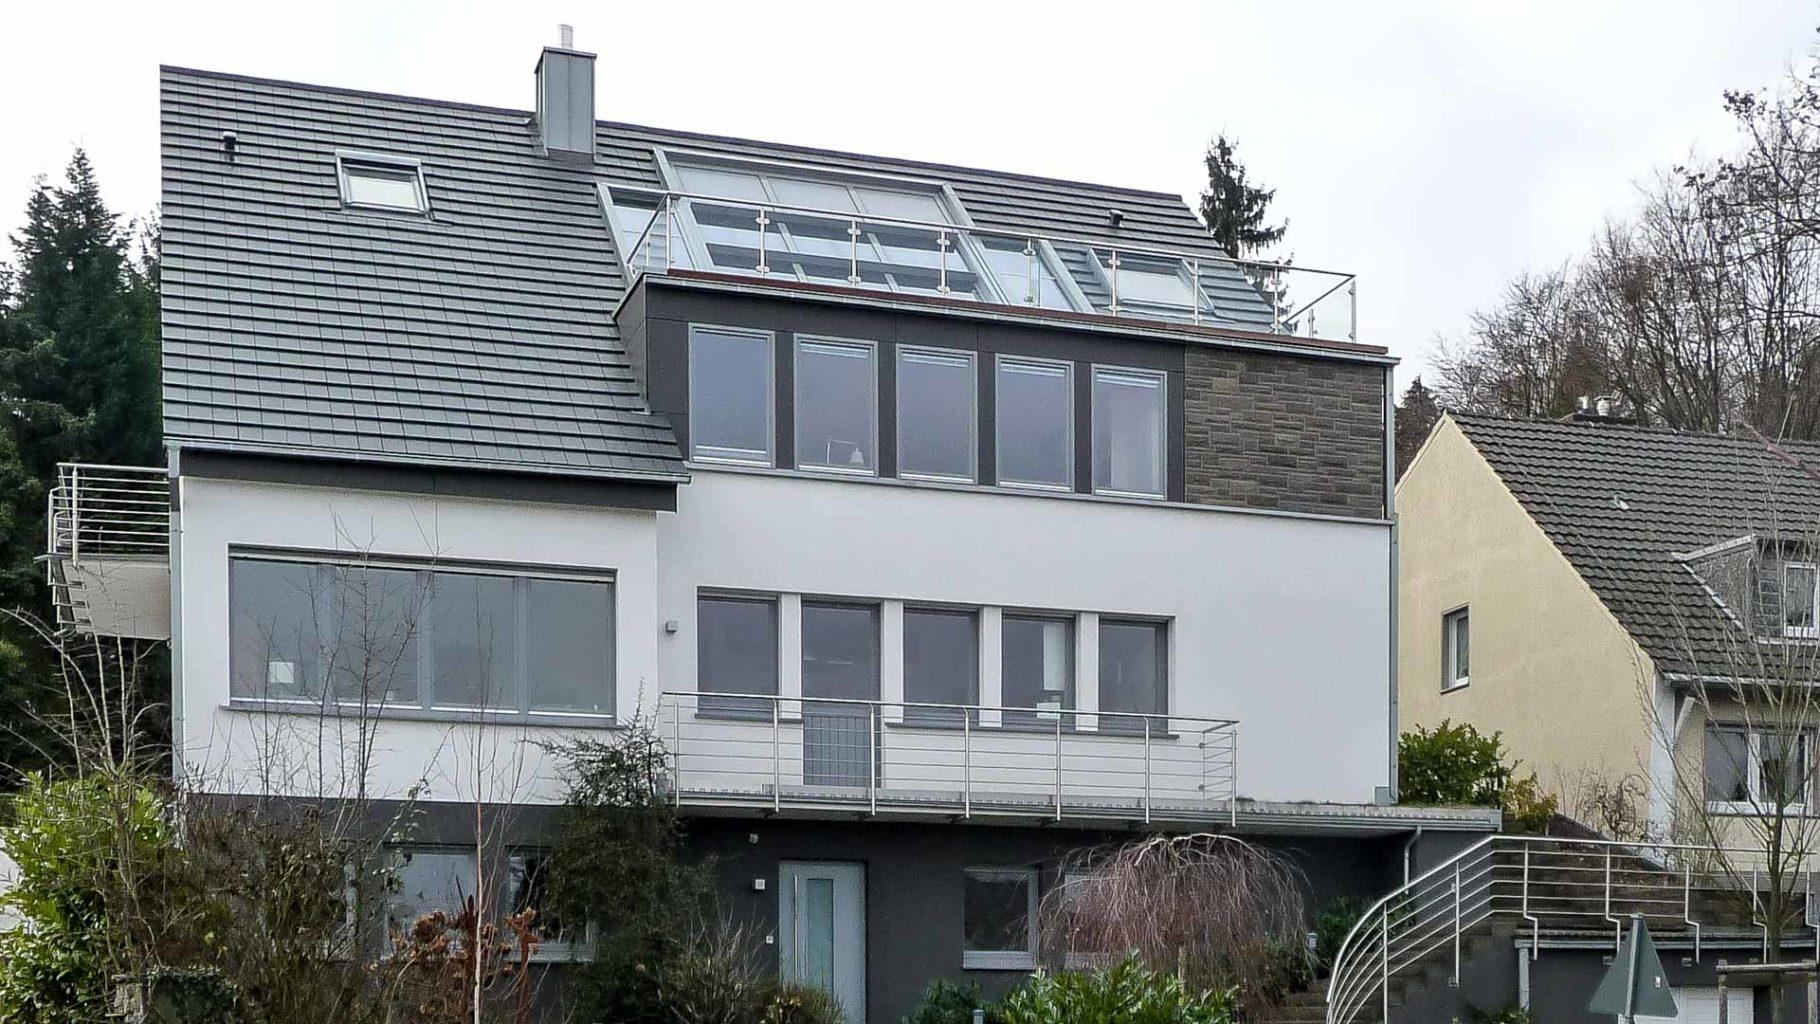 OpenAir Schiebedach in Bonn (Objekt 1074).